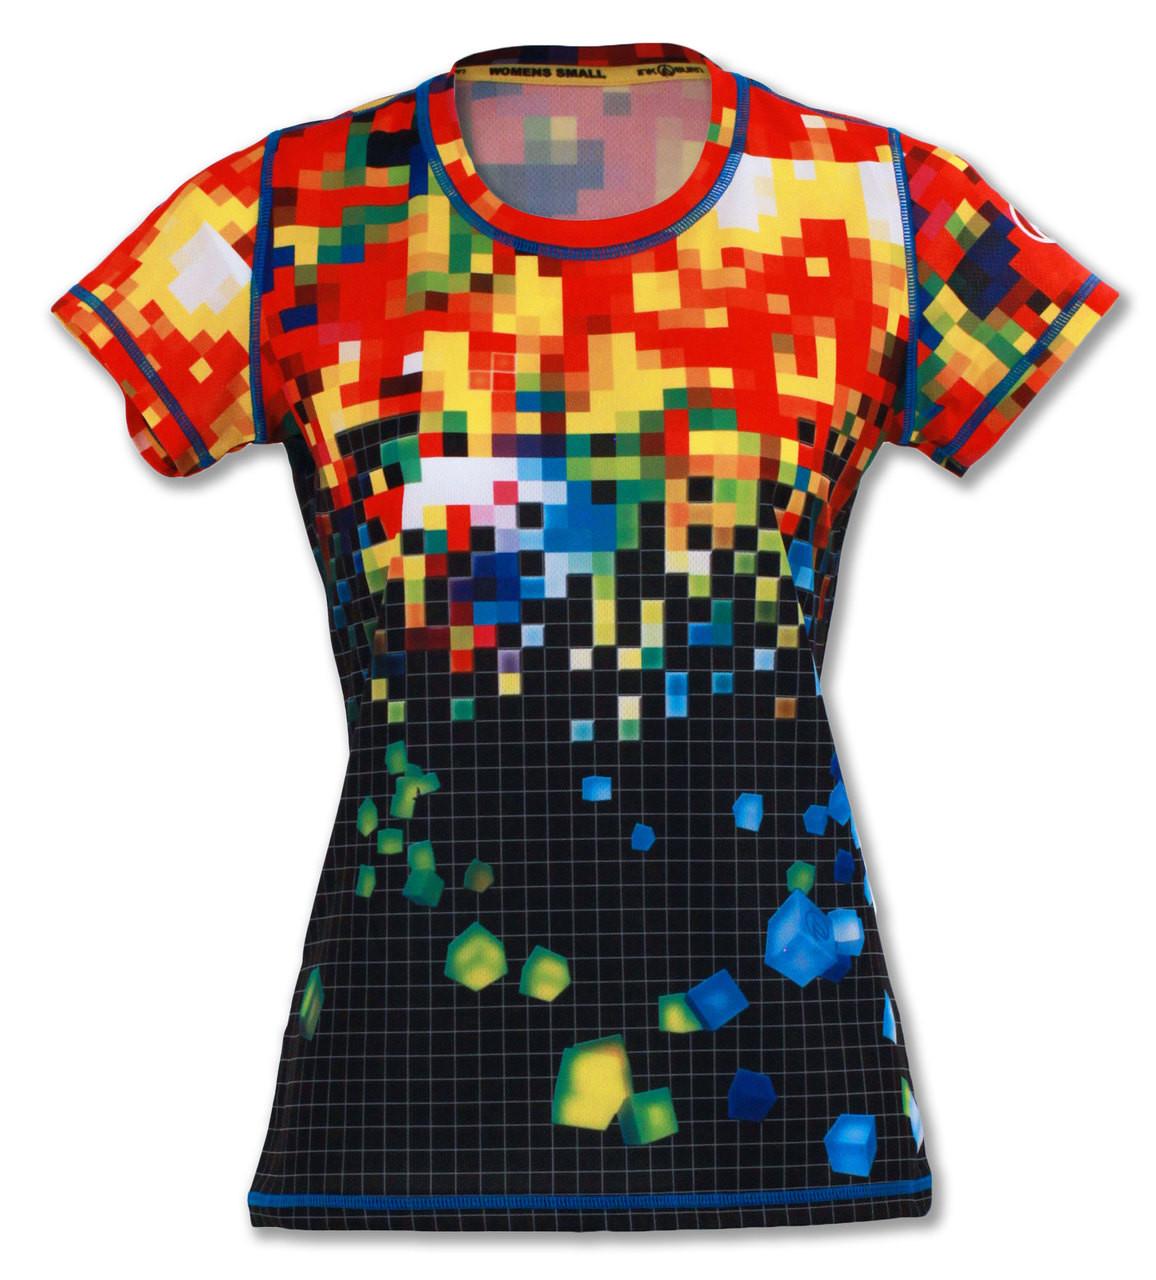 Womens Pixel Tech Shirt For Running Gym Crossfit